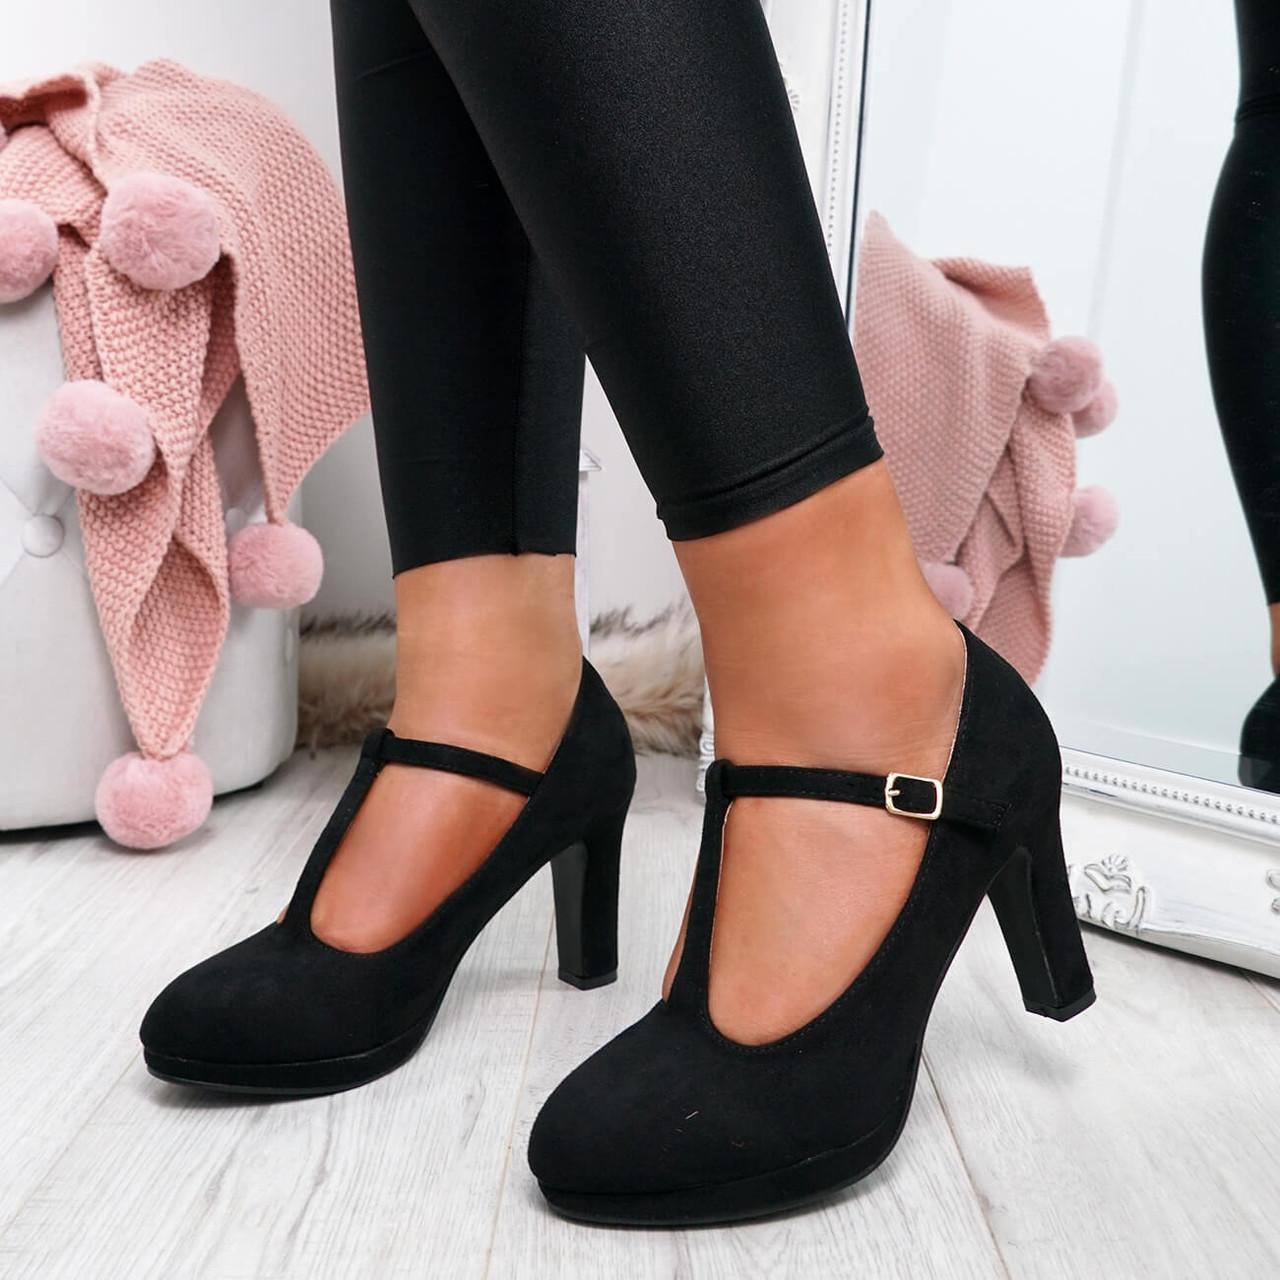 black round toe block heel pumps